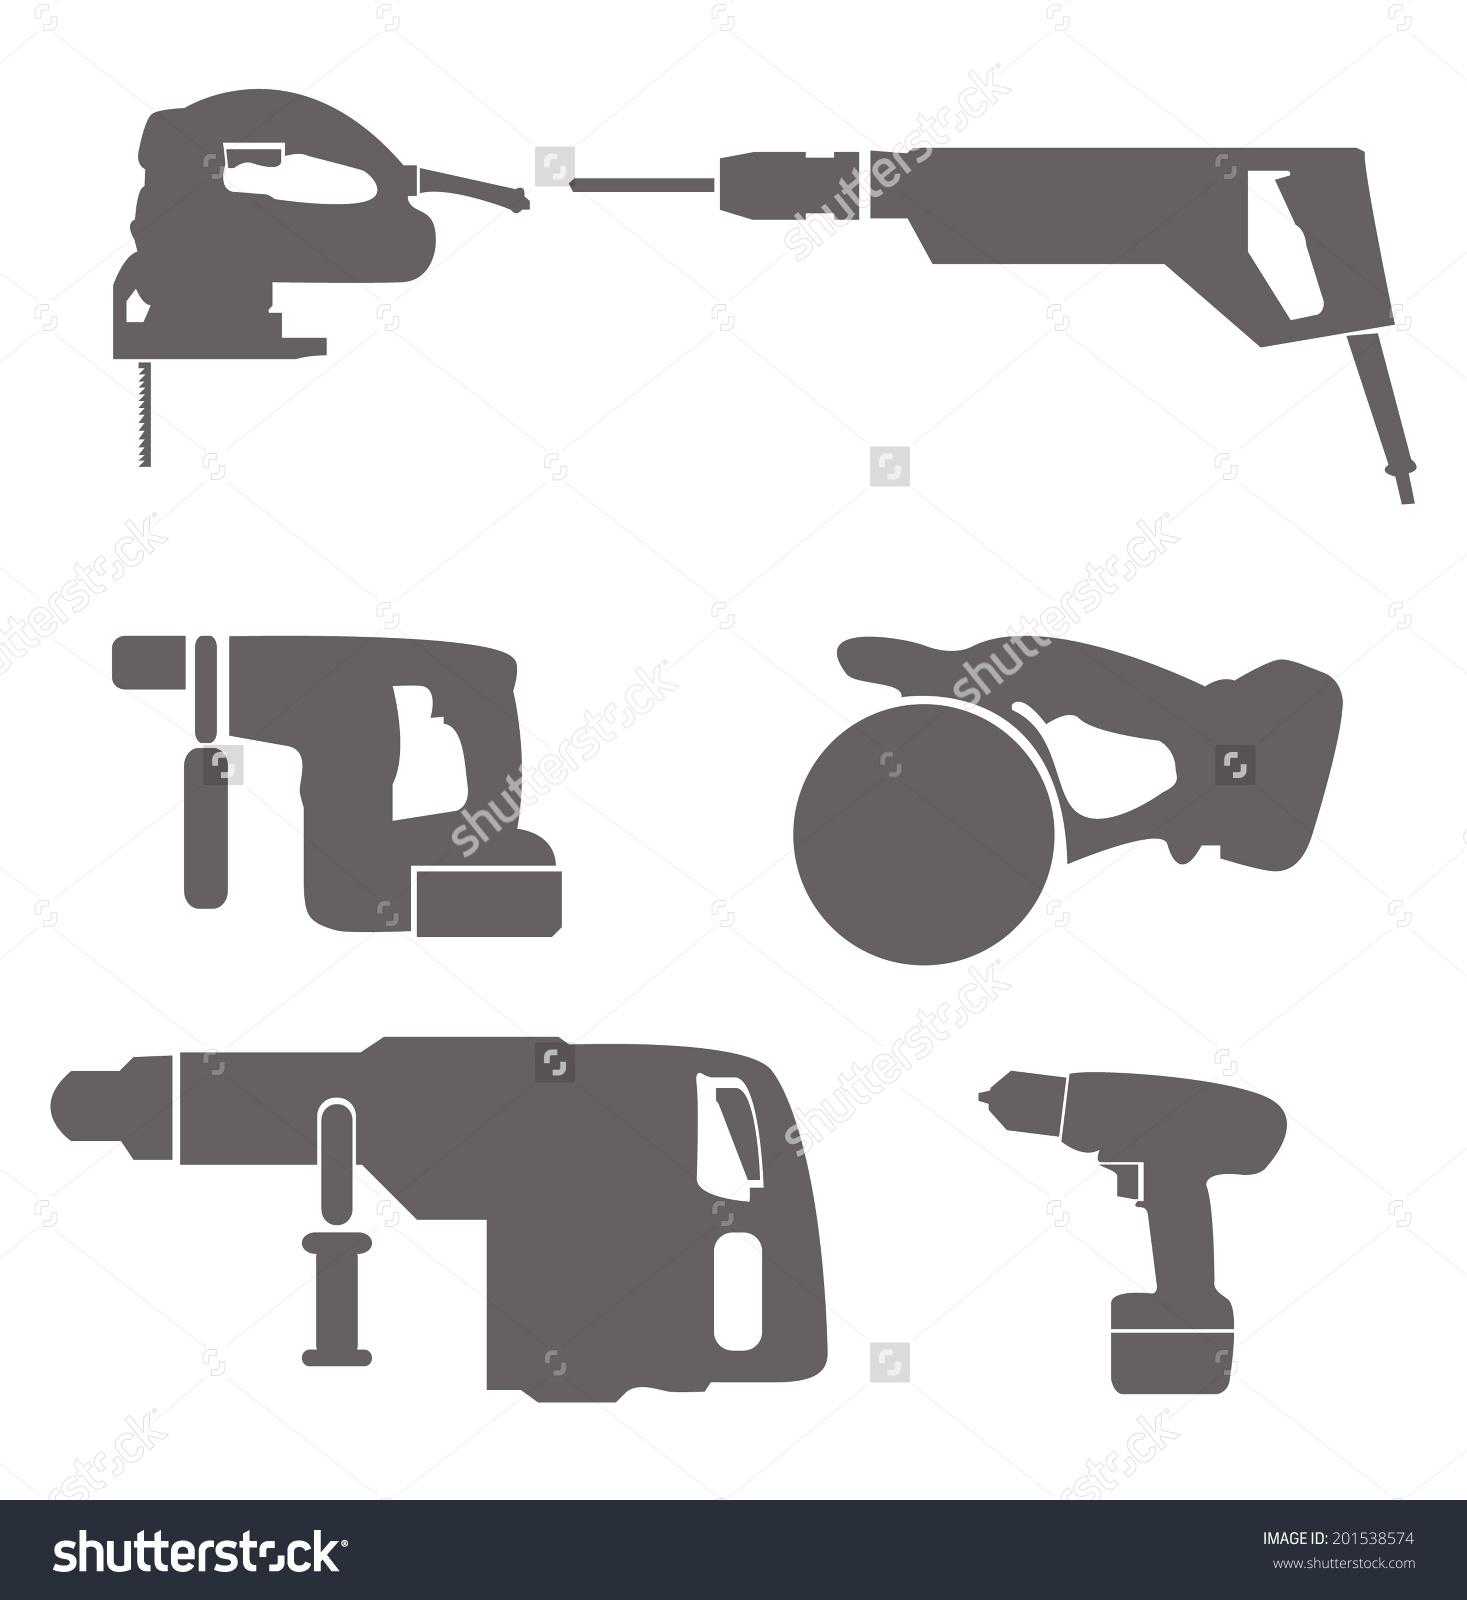 Electric Tools Circular Saw Jigsaw Drilldriver Stock Vector.